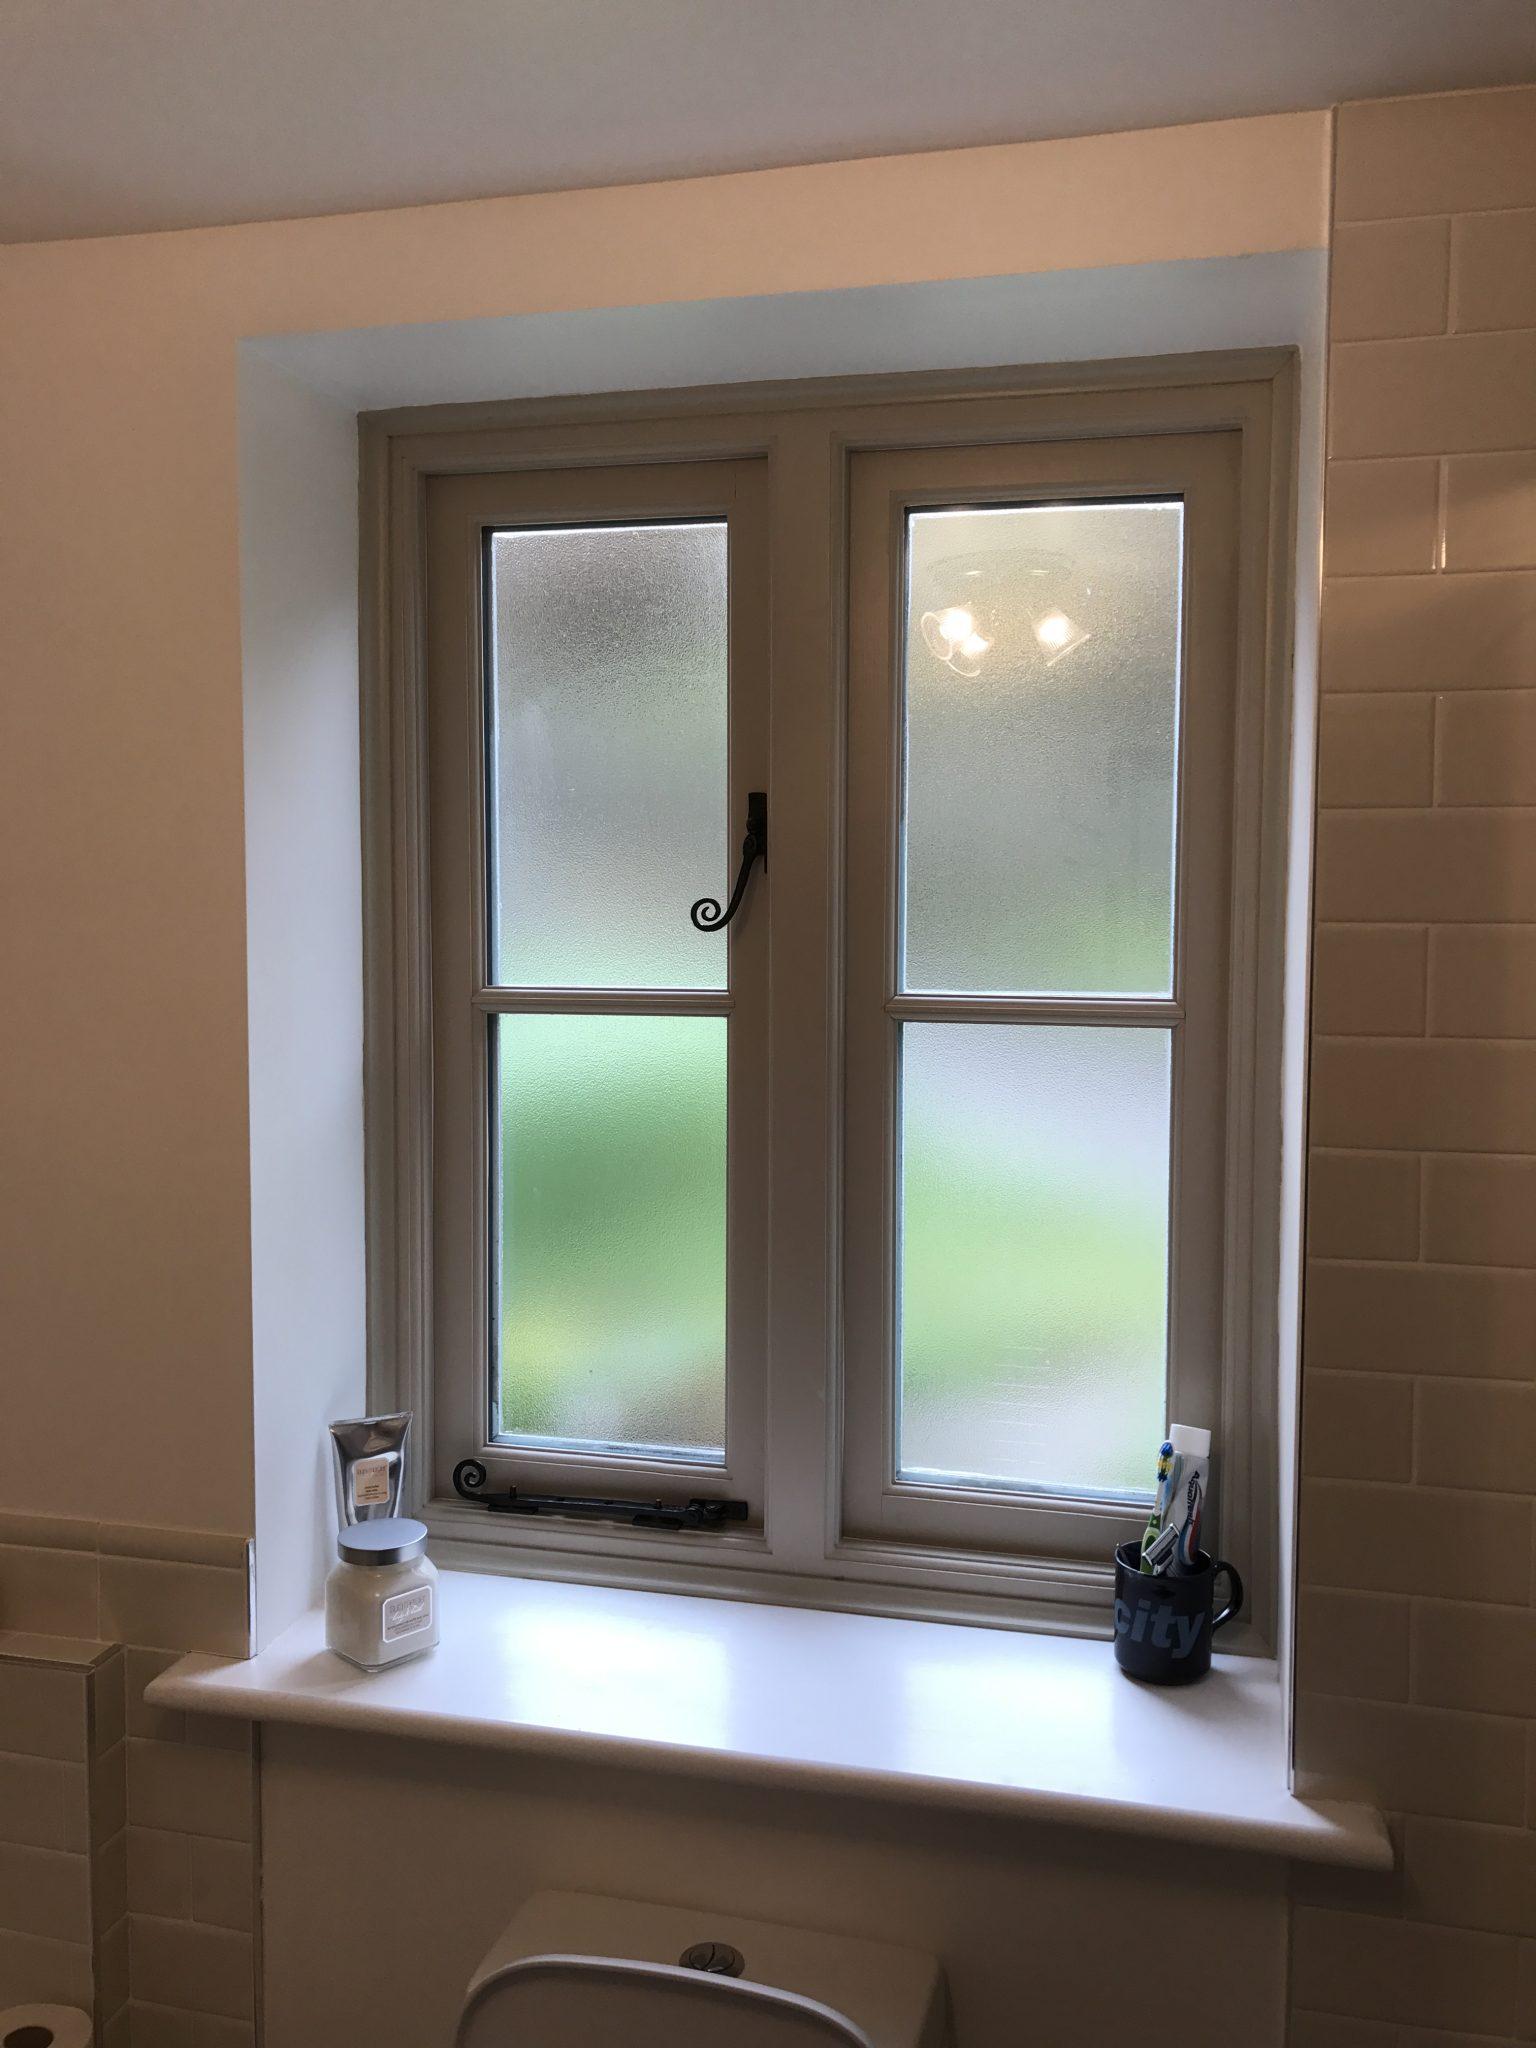 bespoke-bathroom-windows